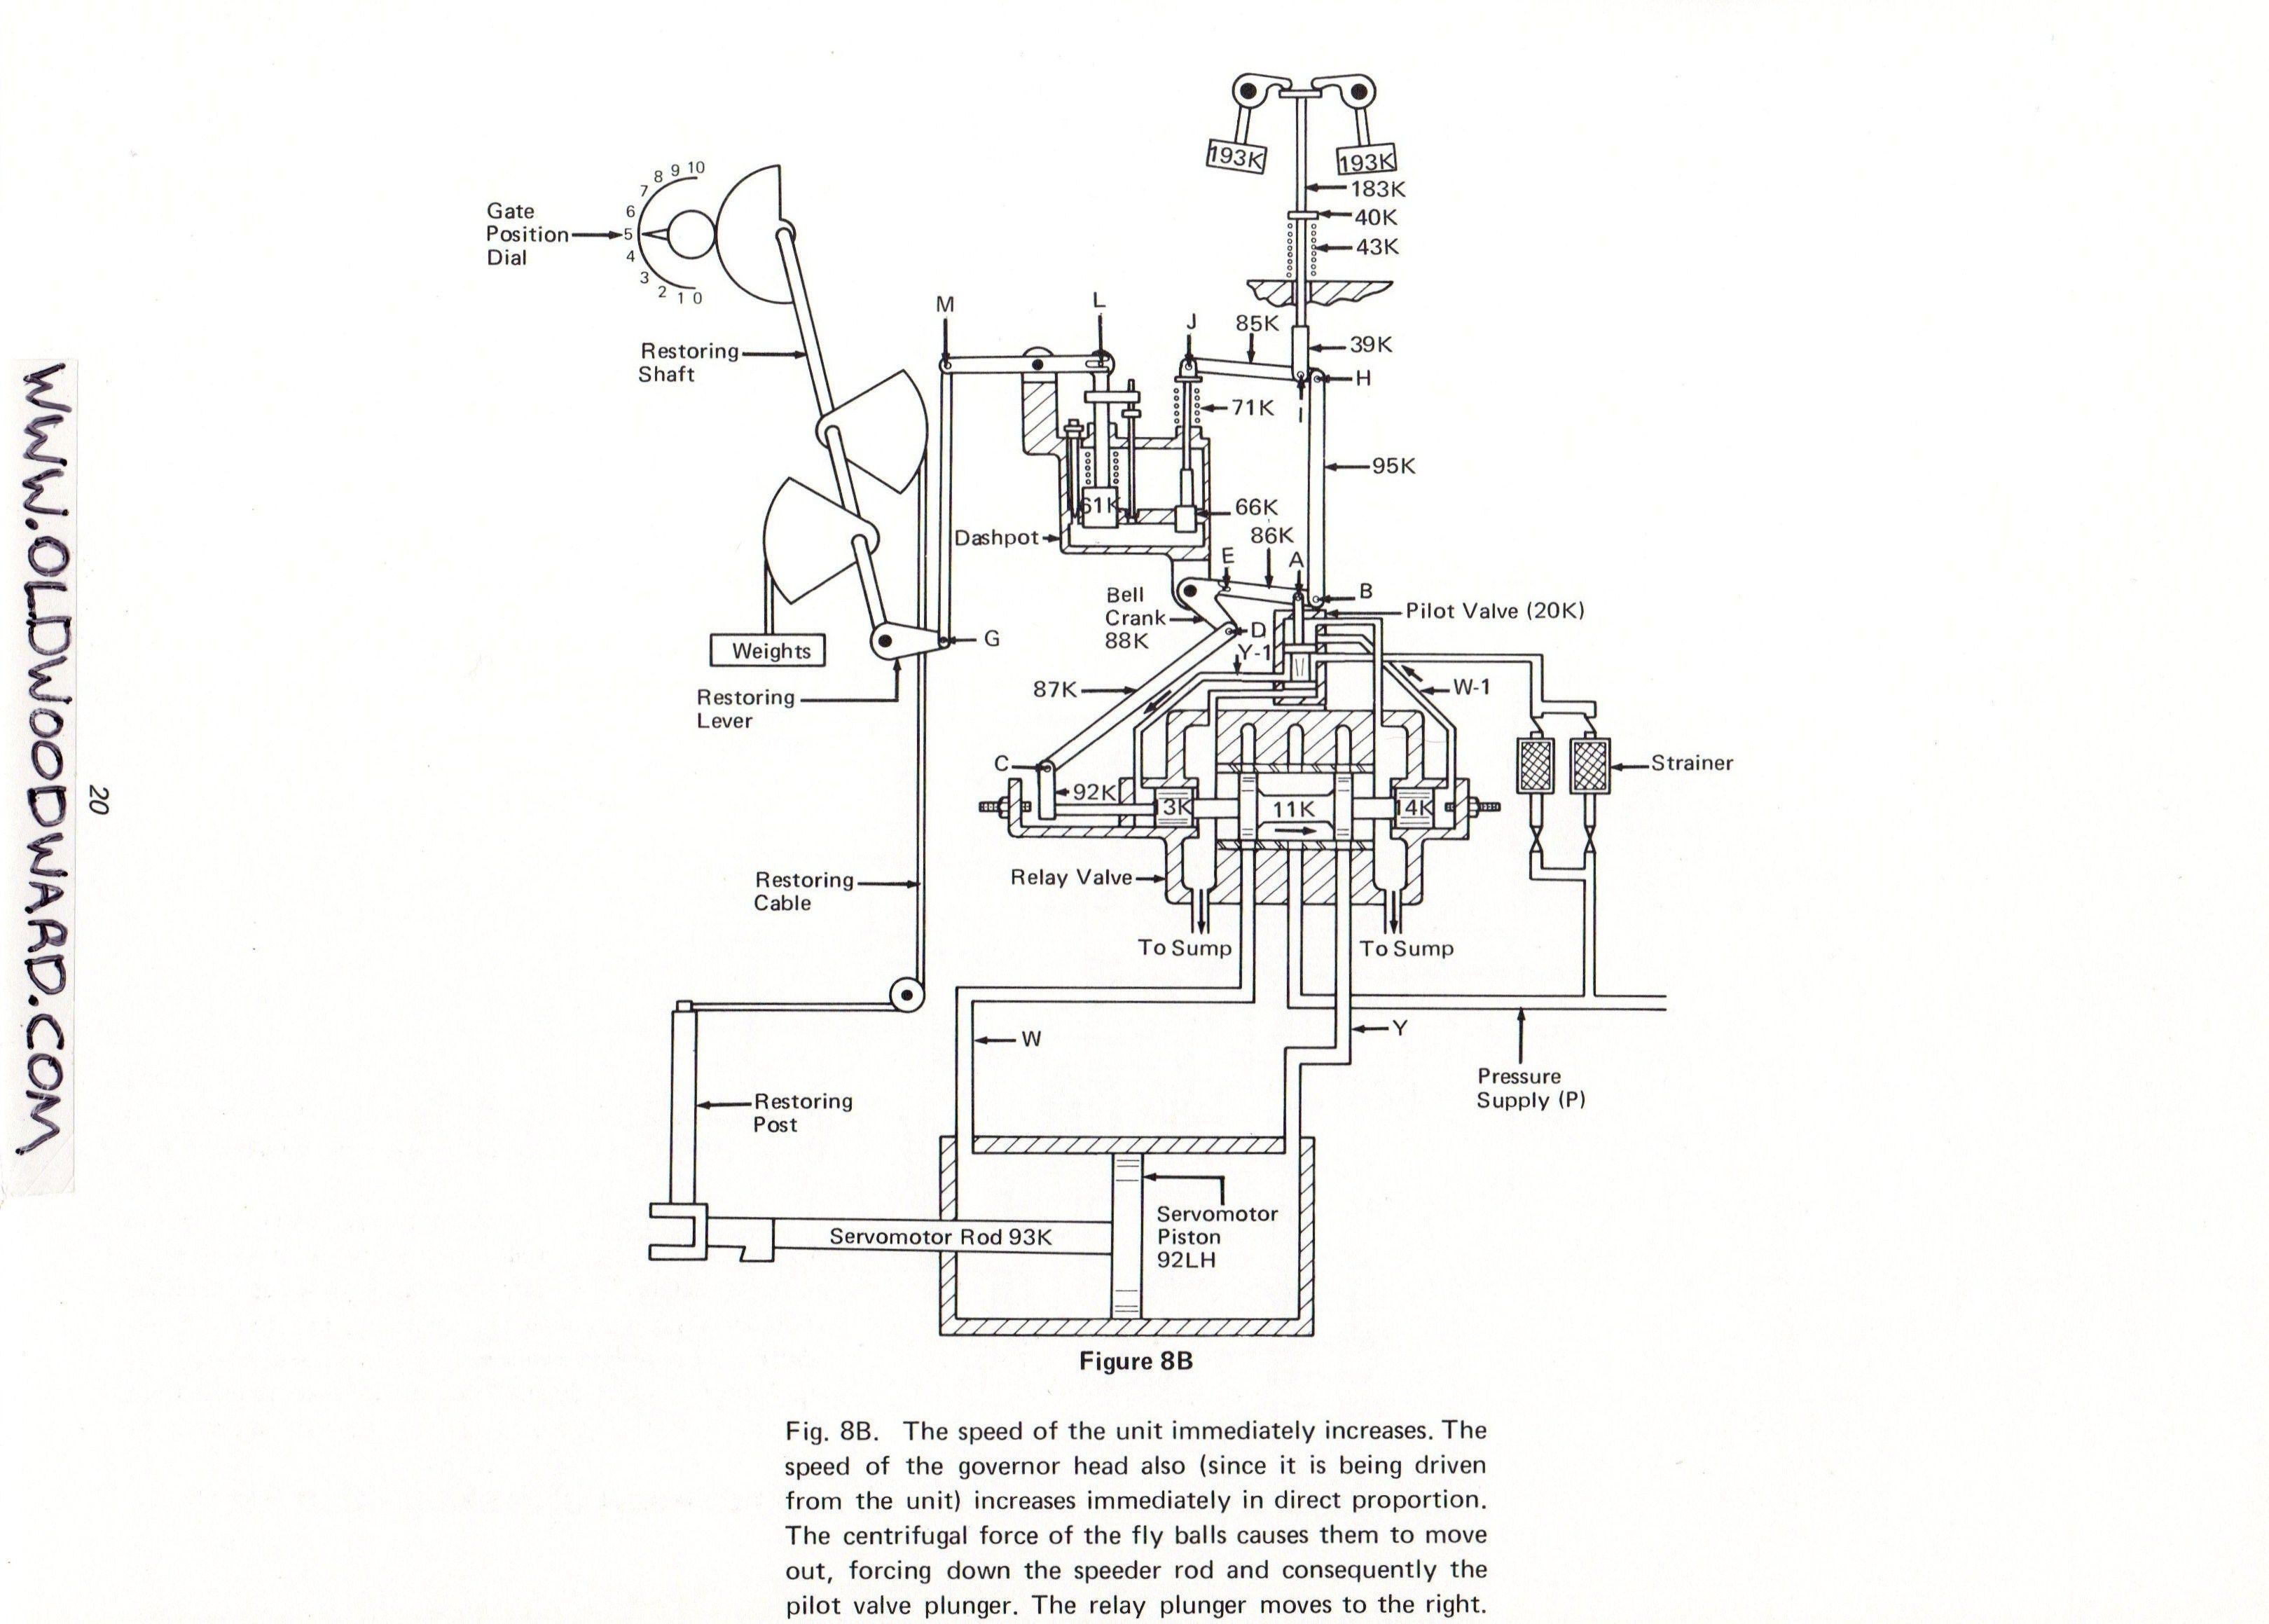 woodward governor company u0026 39 s turbine water wheel gate shaft